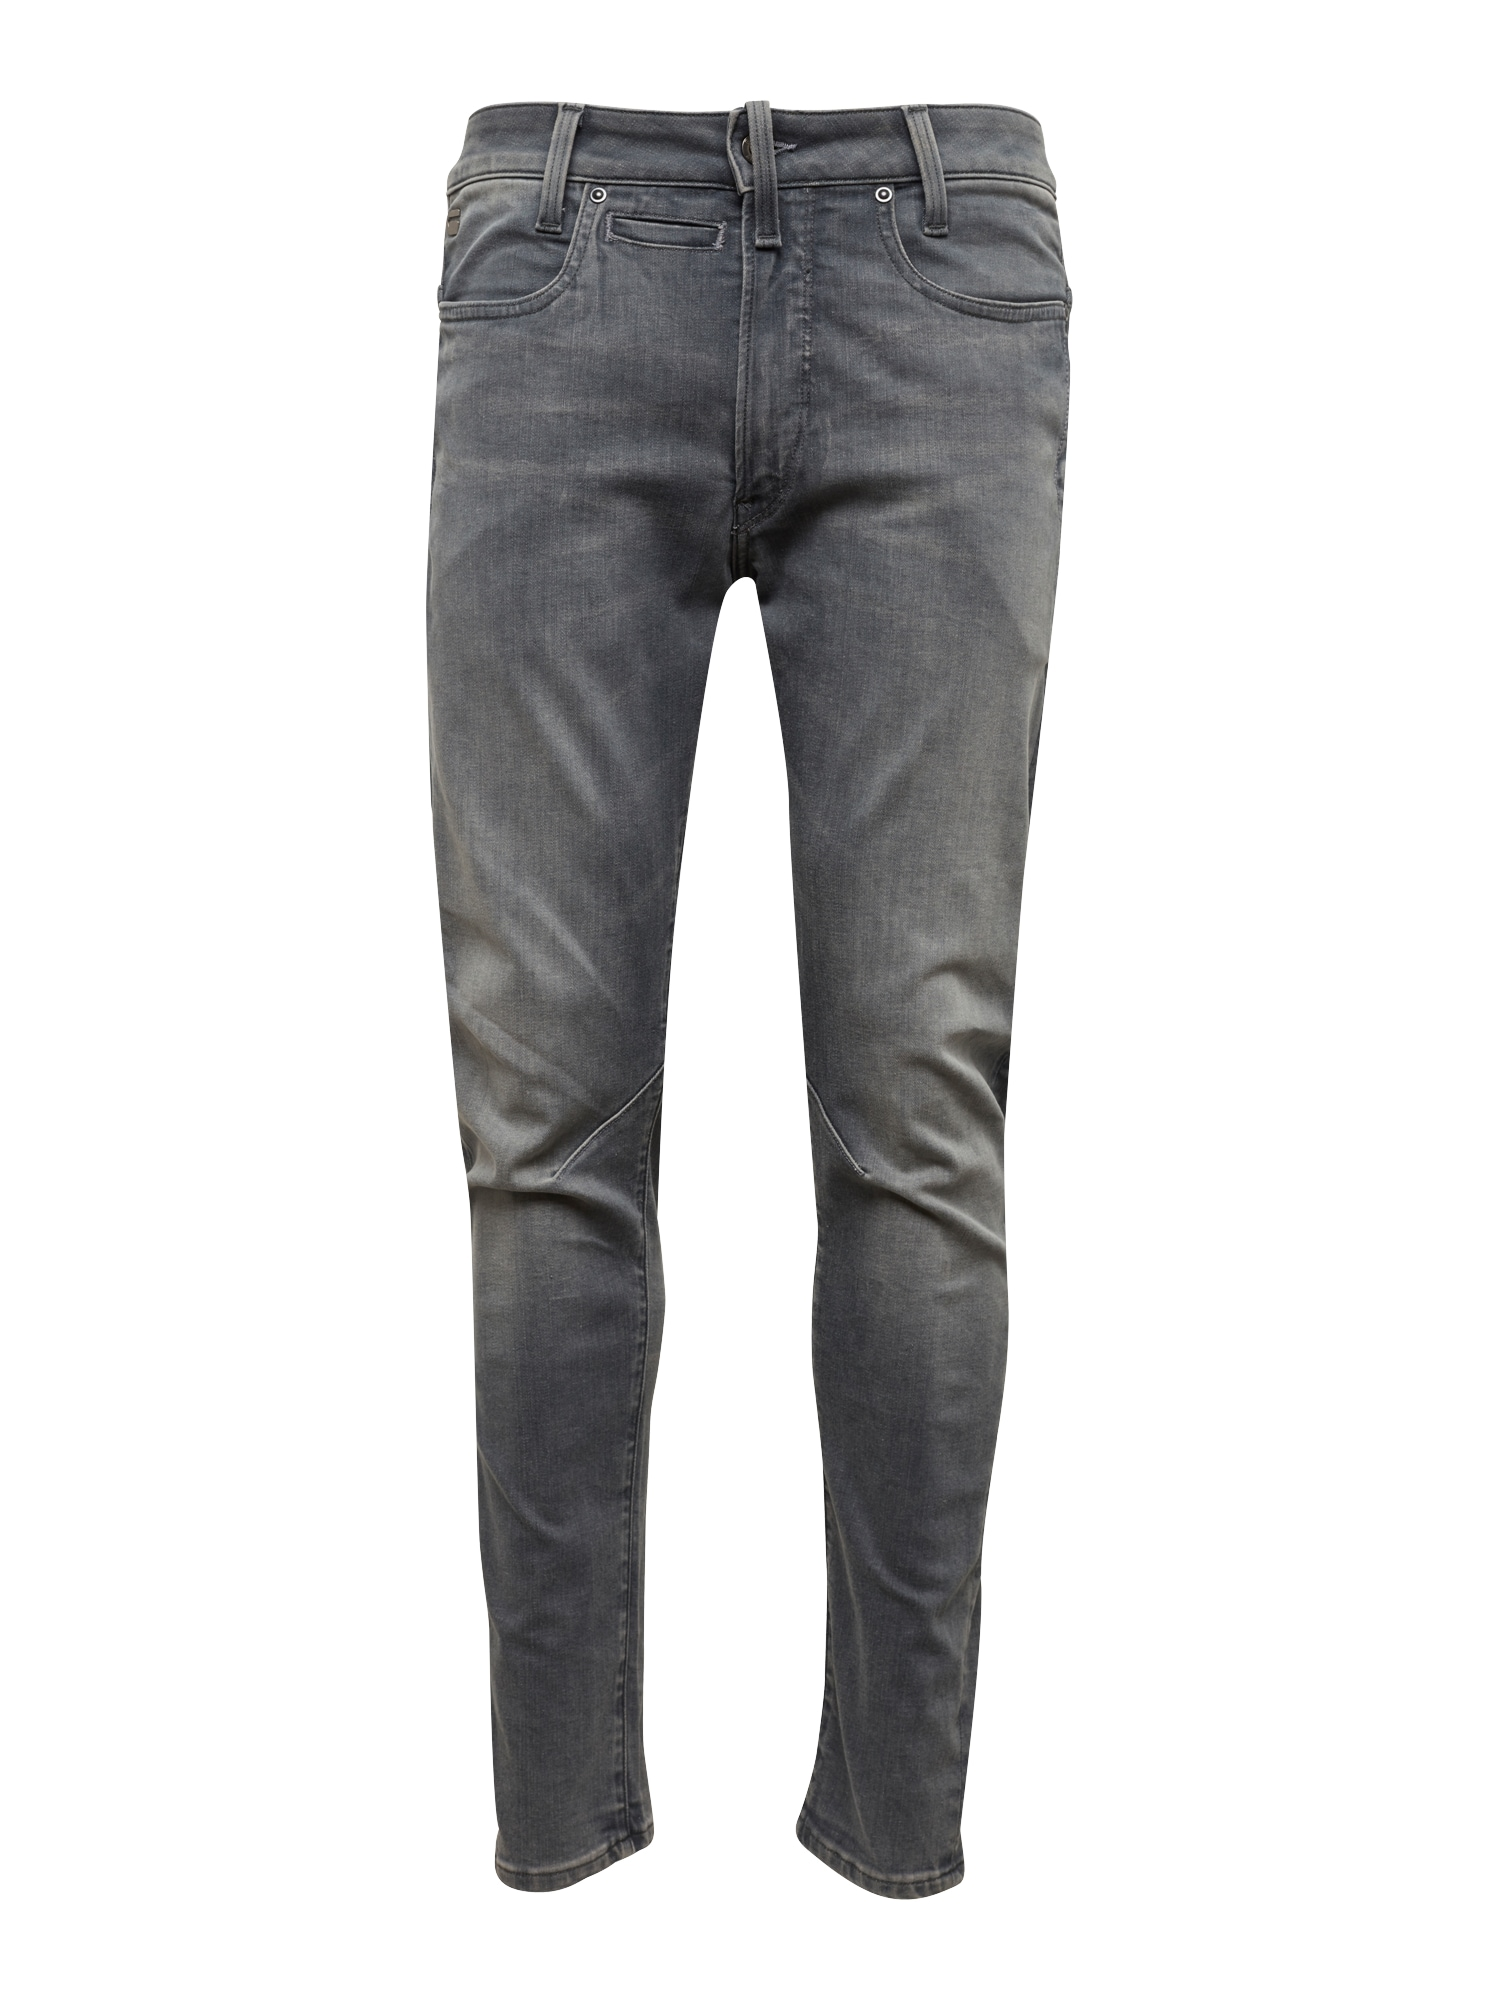 G-STAR RAW Heren Jeans D-Staq 3D Skinny grey denim lichtgrijs